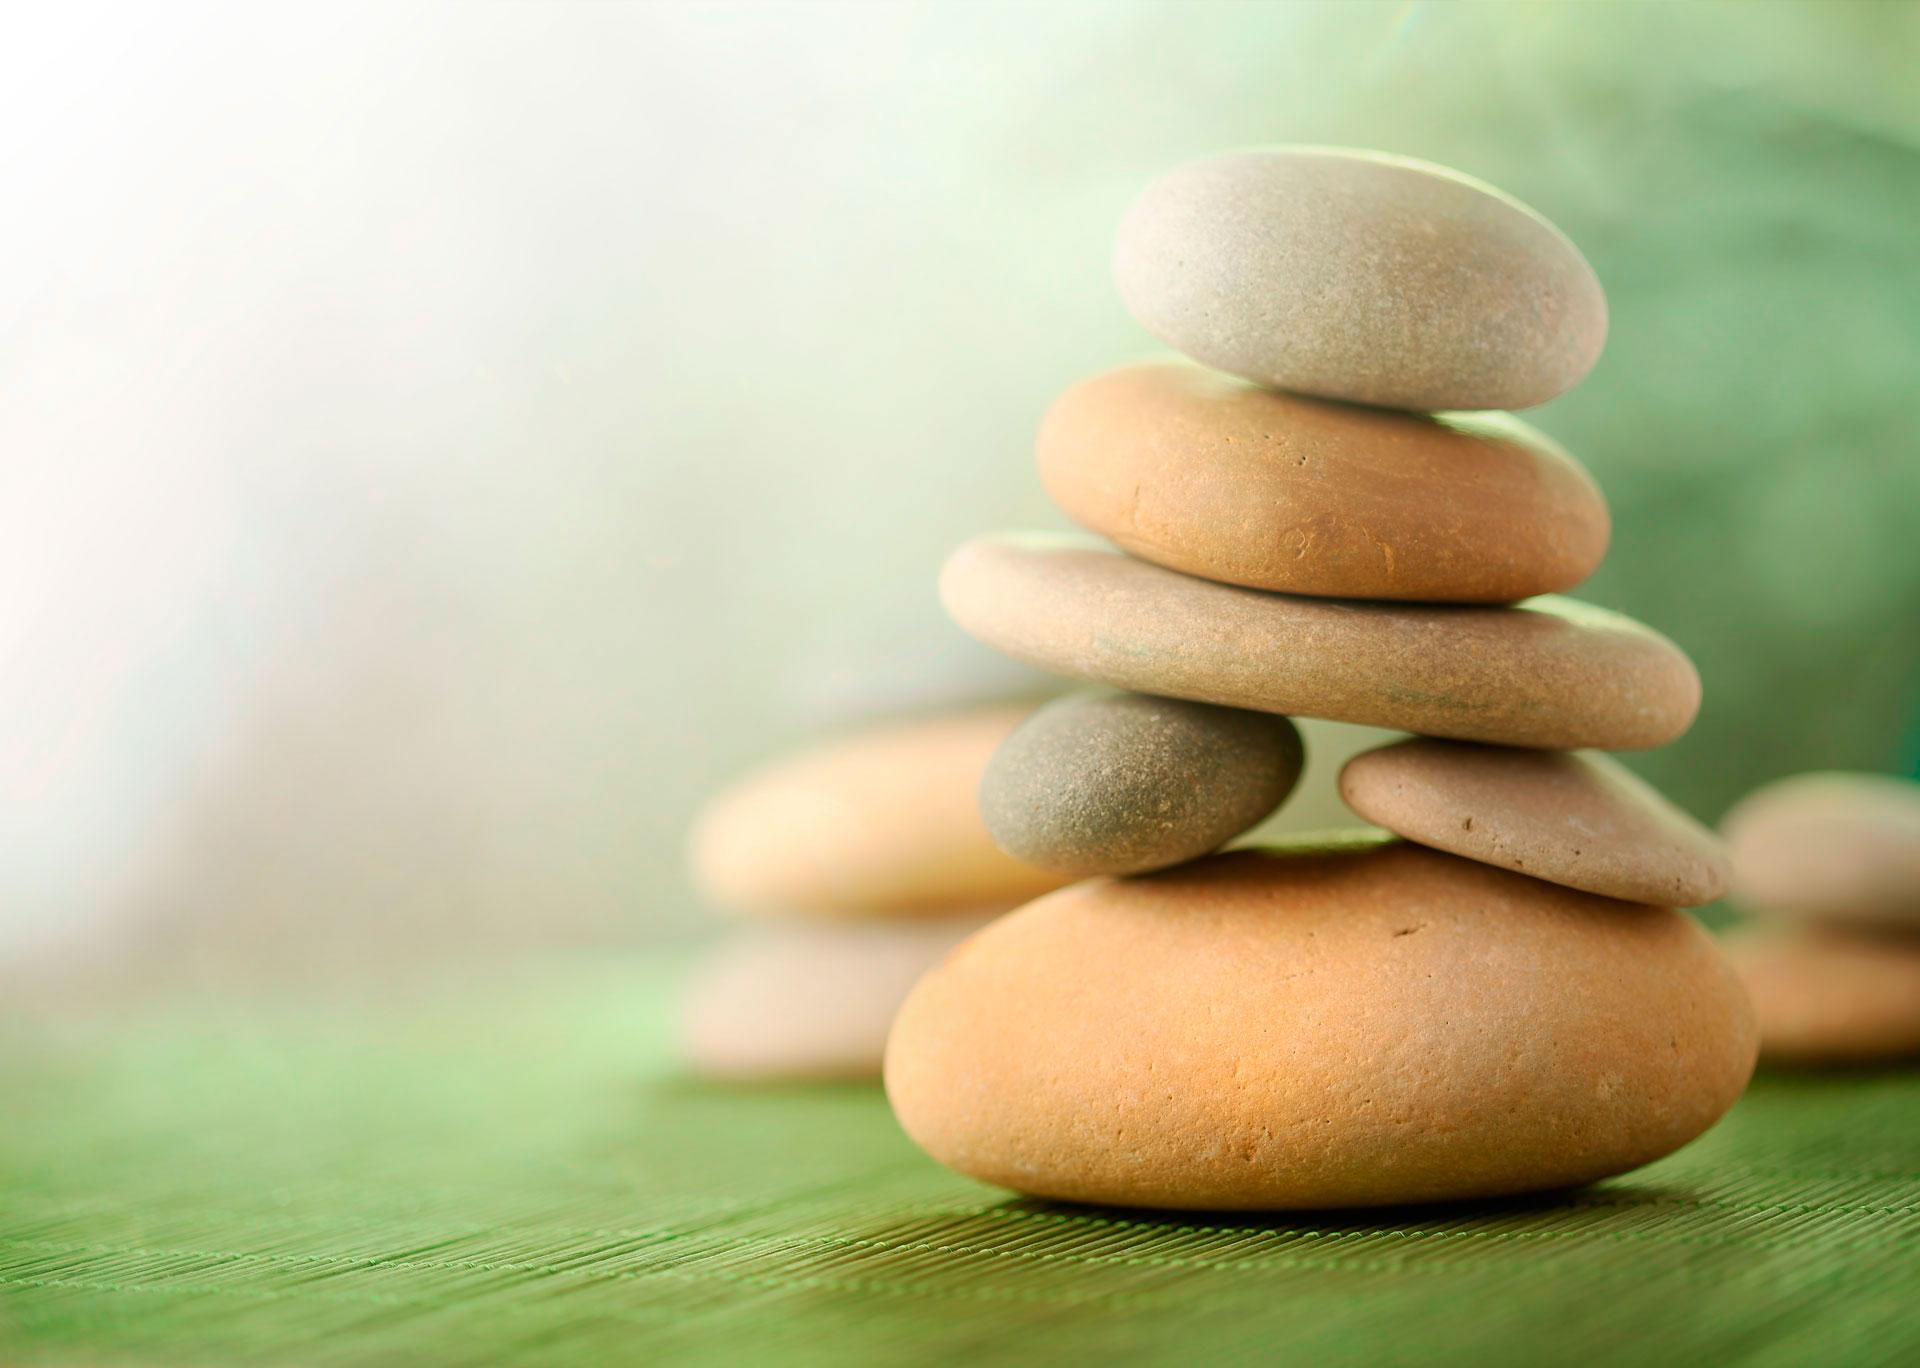 stacked-stones-on-mat-retreats_web